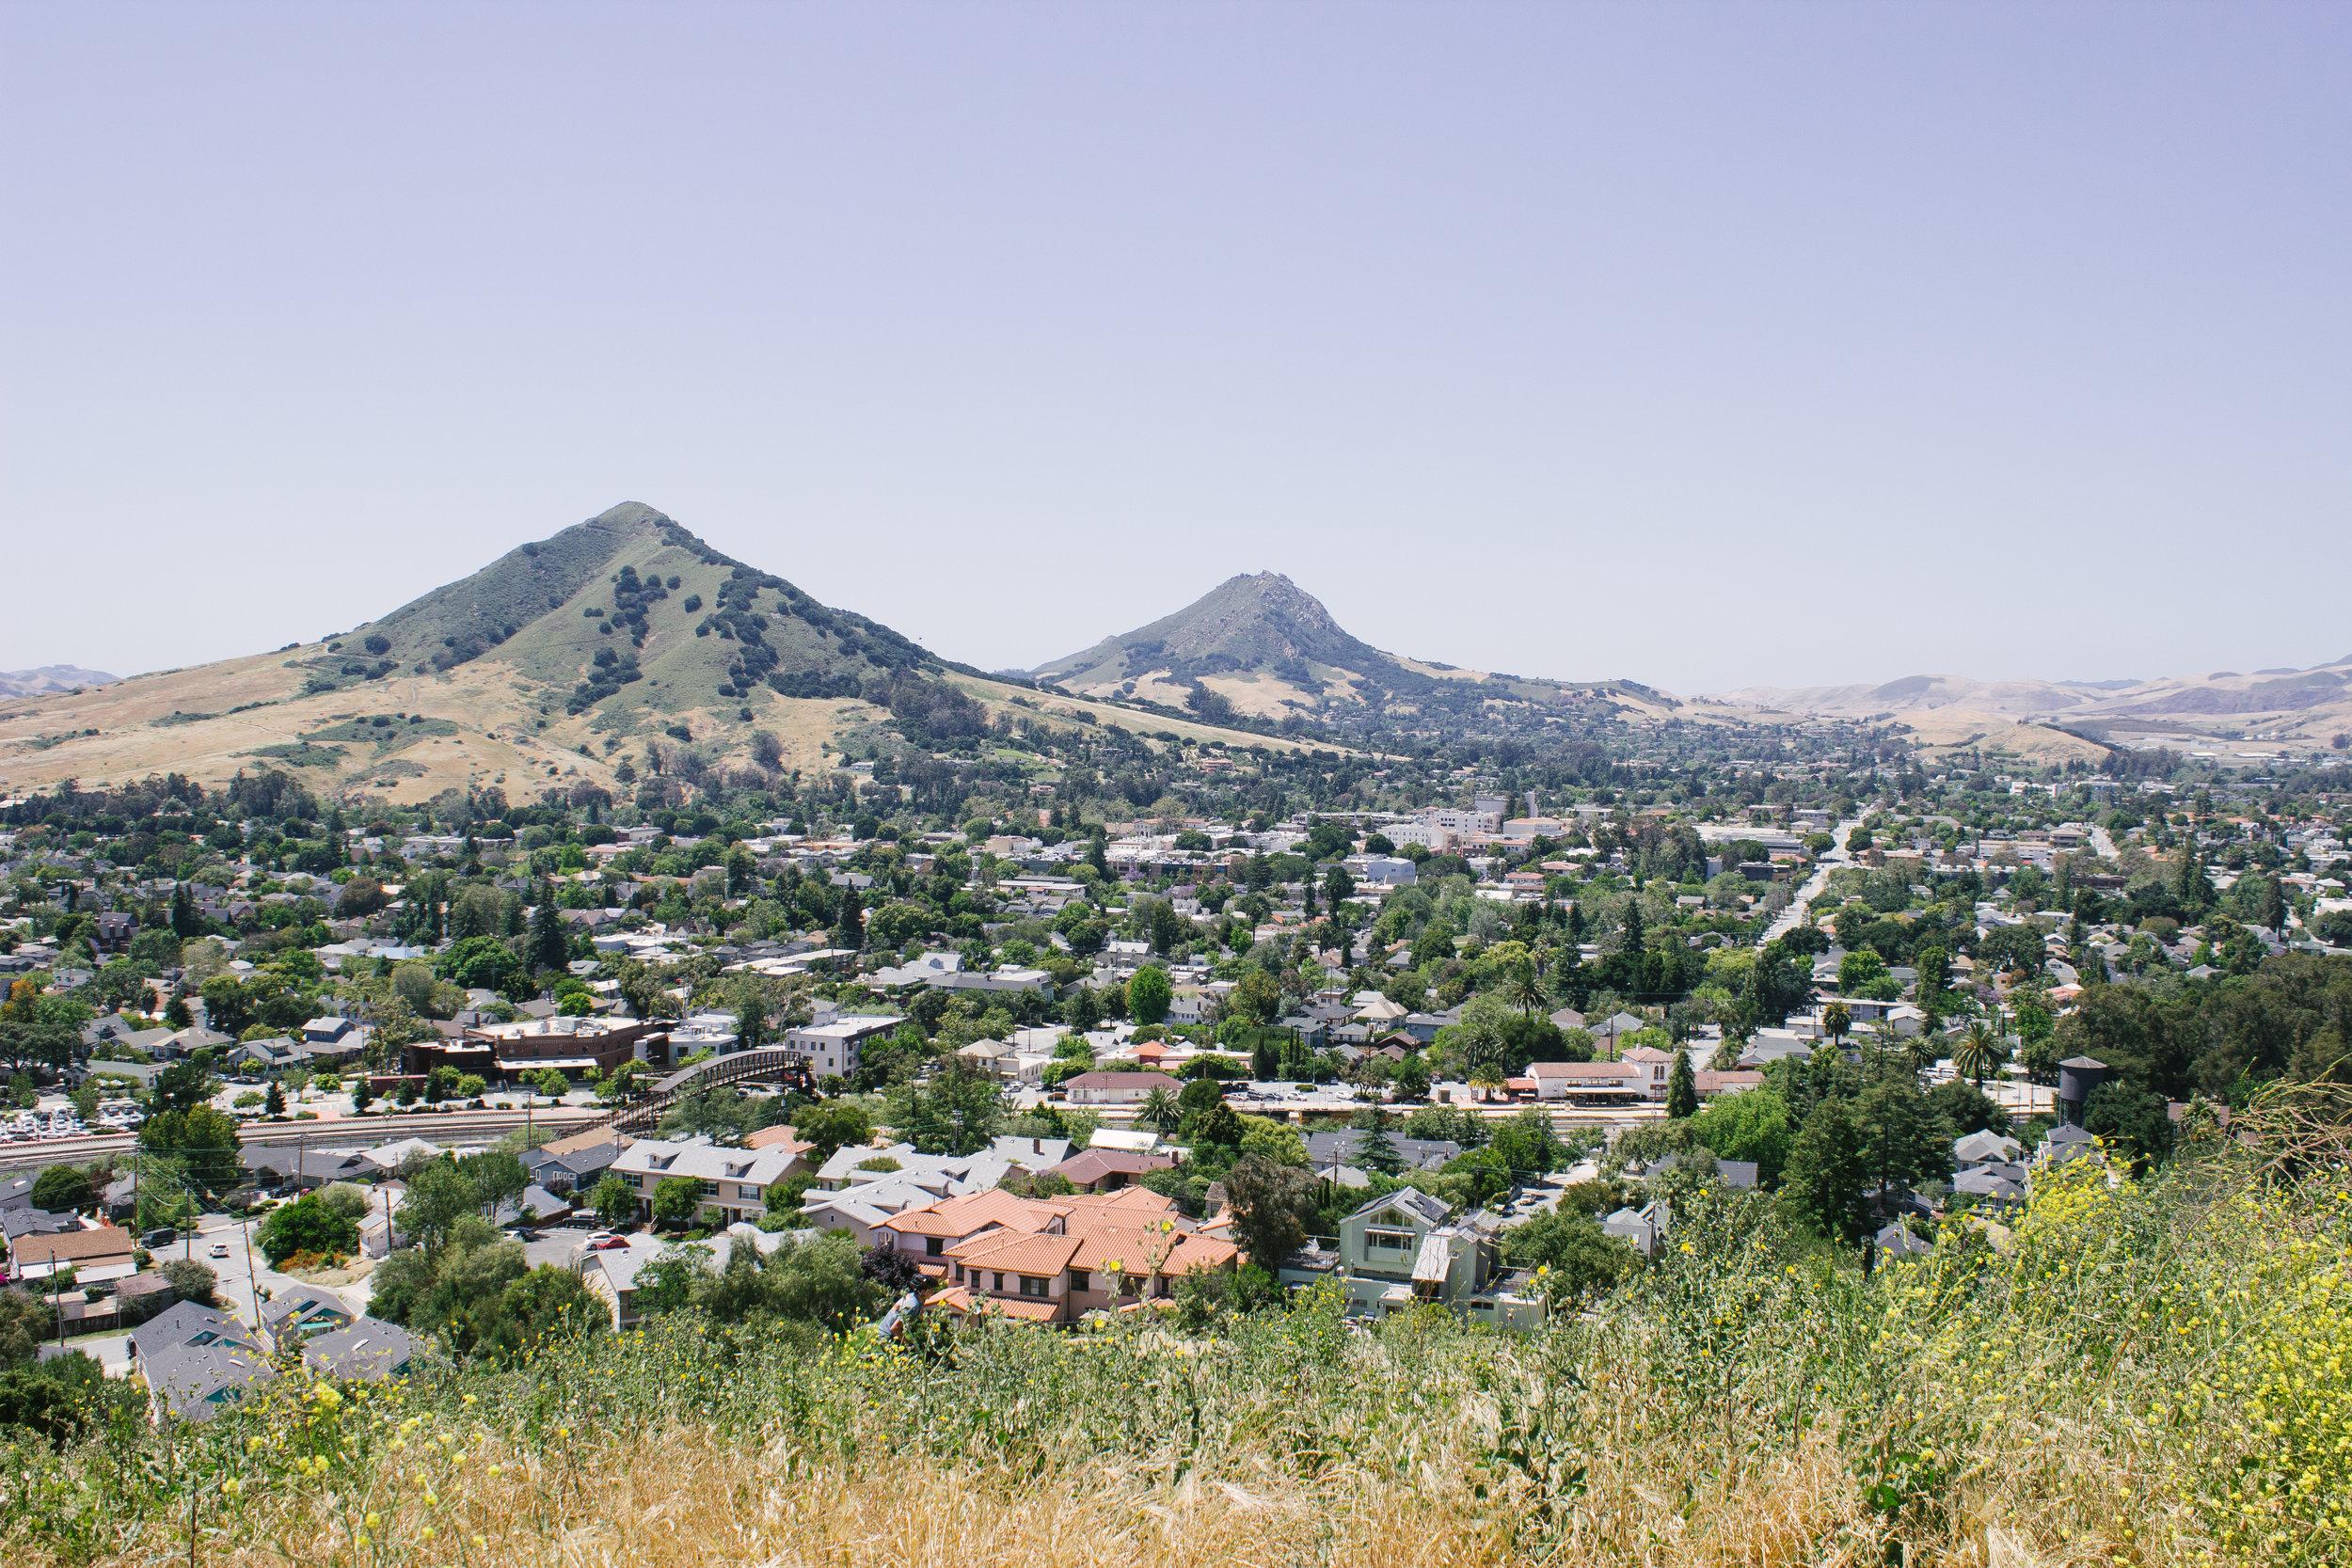 san_luis_obispo_central_coast_california-99.jpg